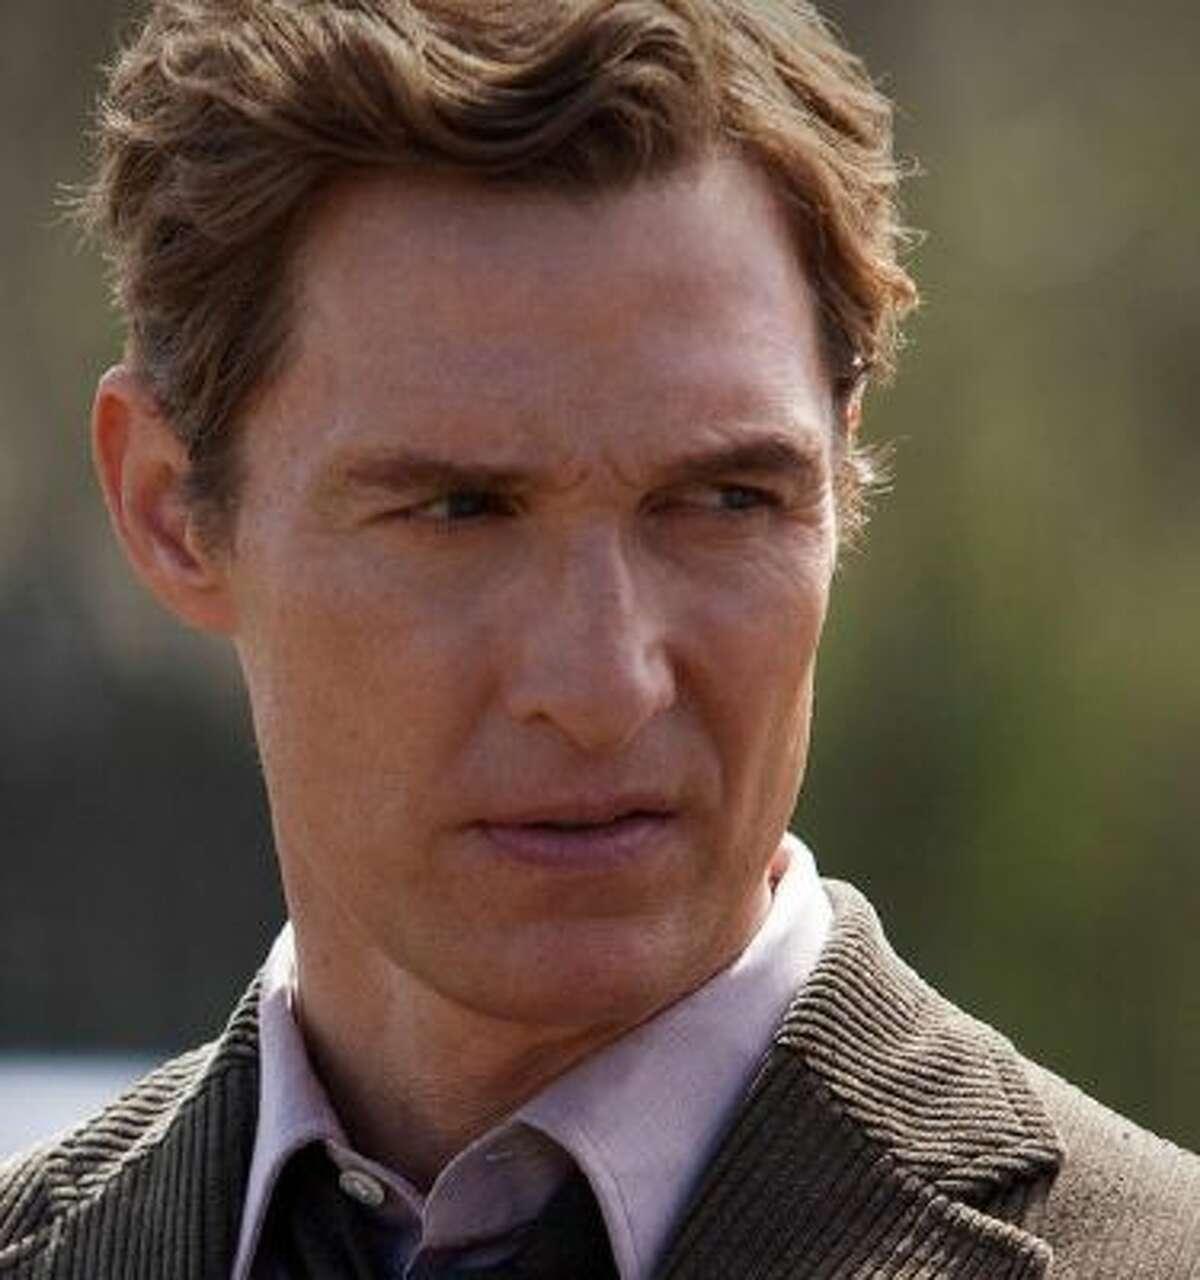 Matthew McConaughey plays former Louisiana detective Rust Cohle.